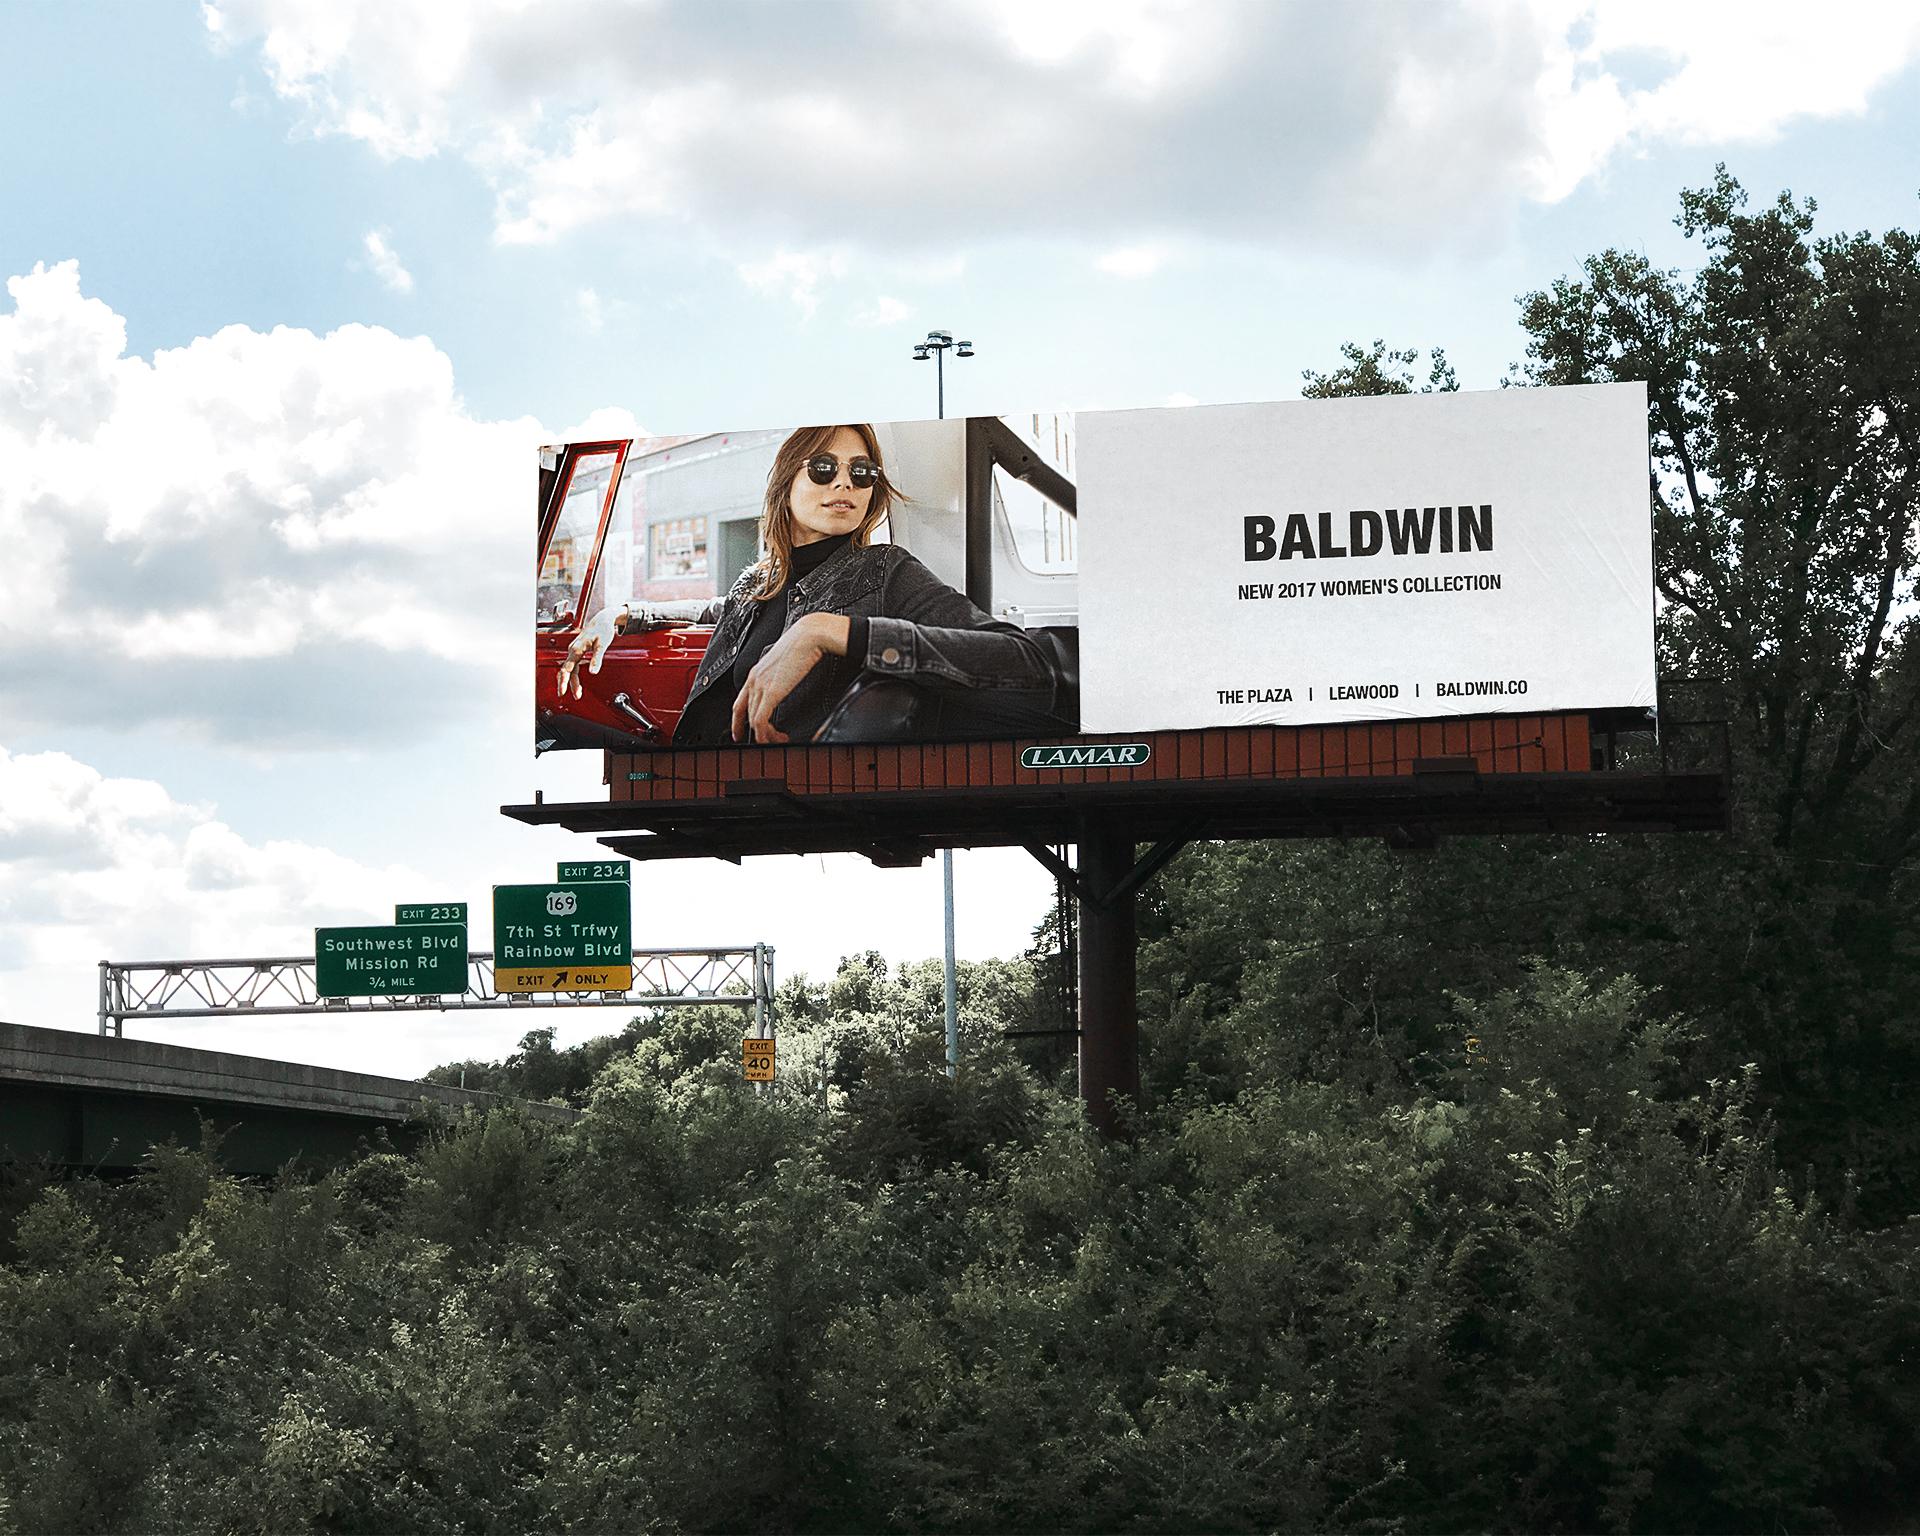 BALDWIN_BILLBOARD.jpg